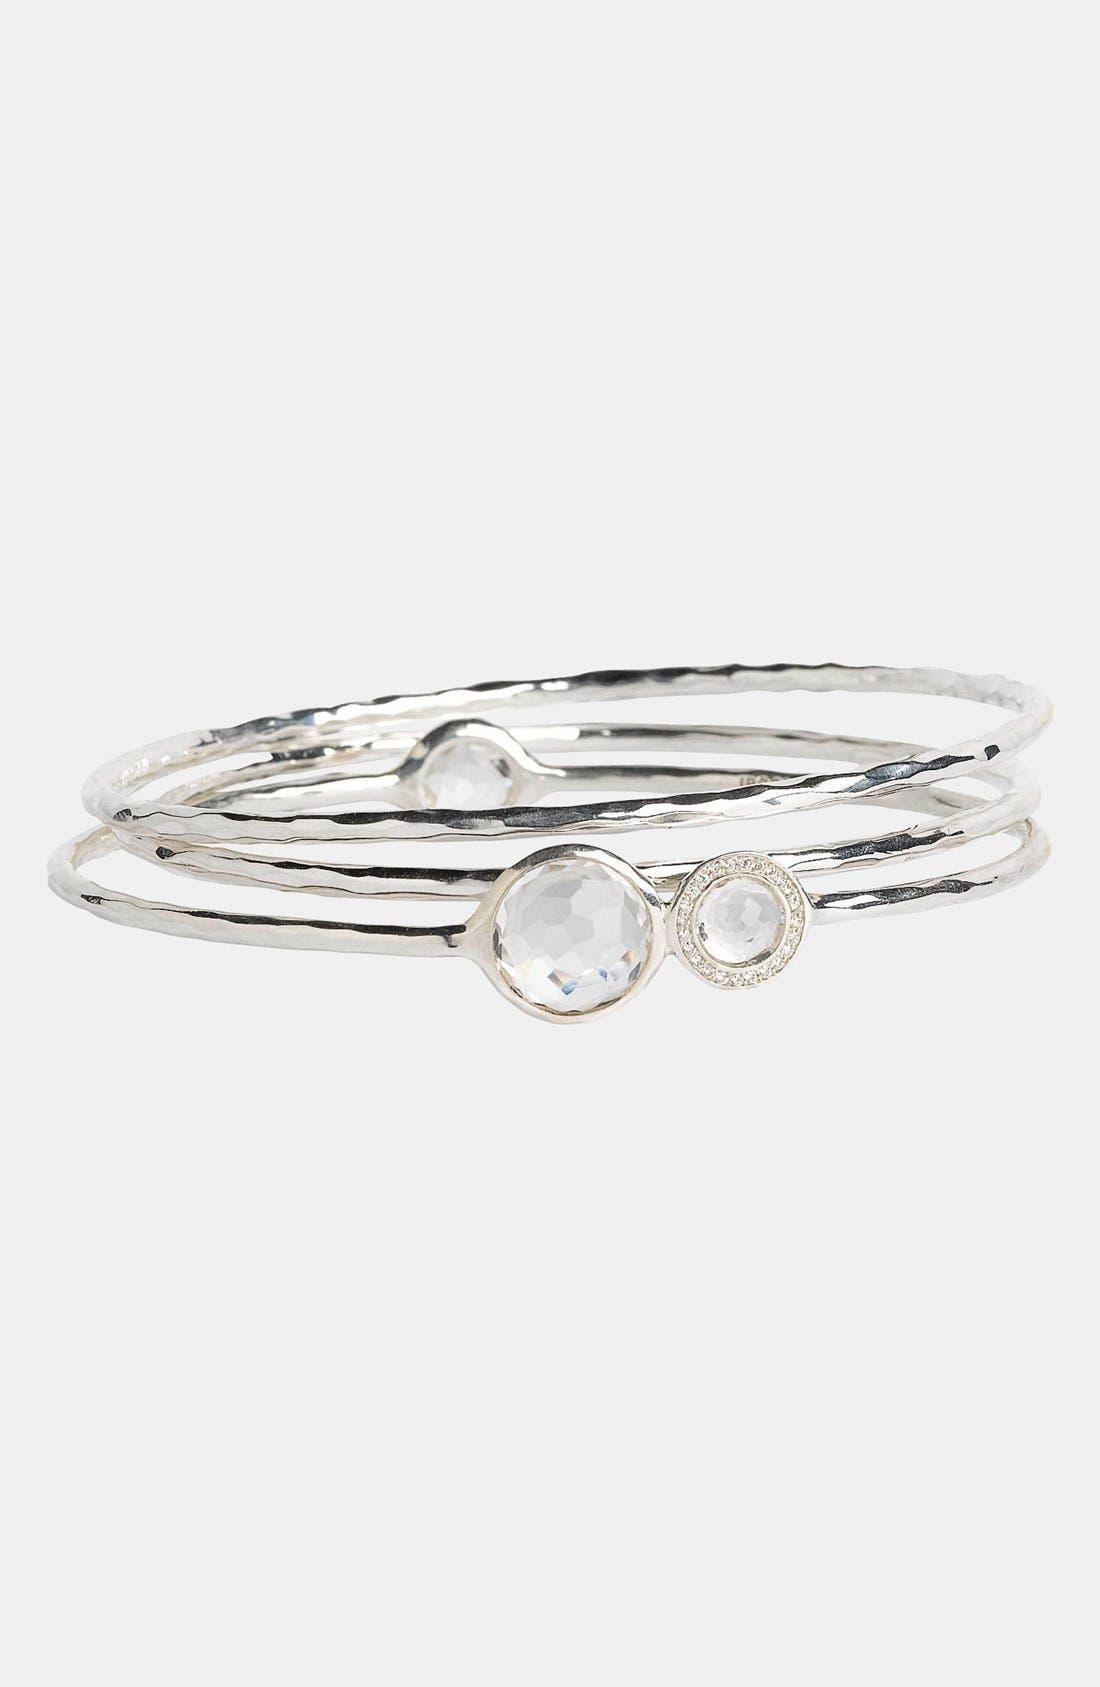 Alternate Image 1 Selected - Ippolita 'Silver Diamond - Lollipop' Stone & Diamond Bangles (Set of 3) (Nordstrom Exclusive)